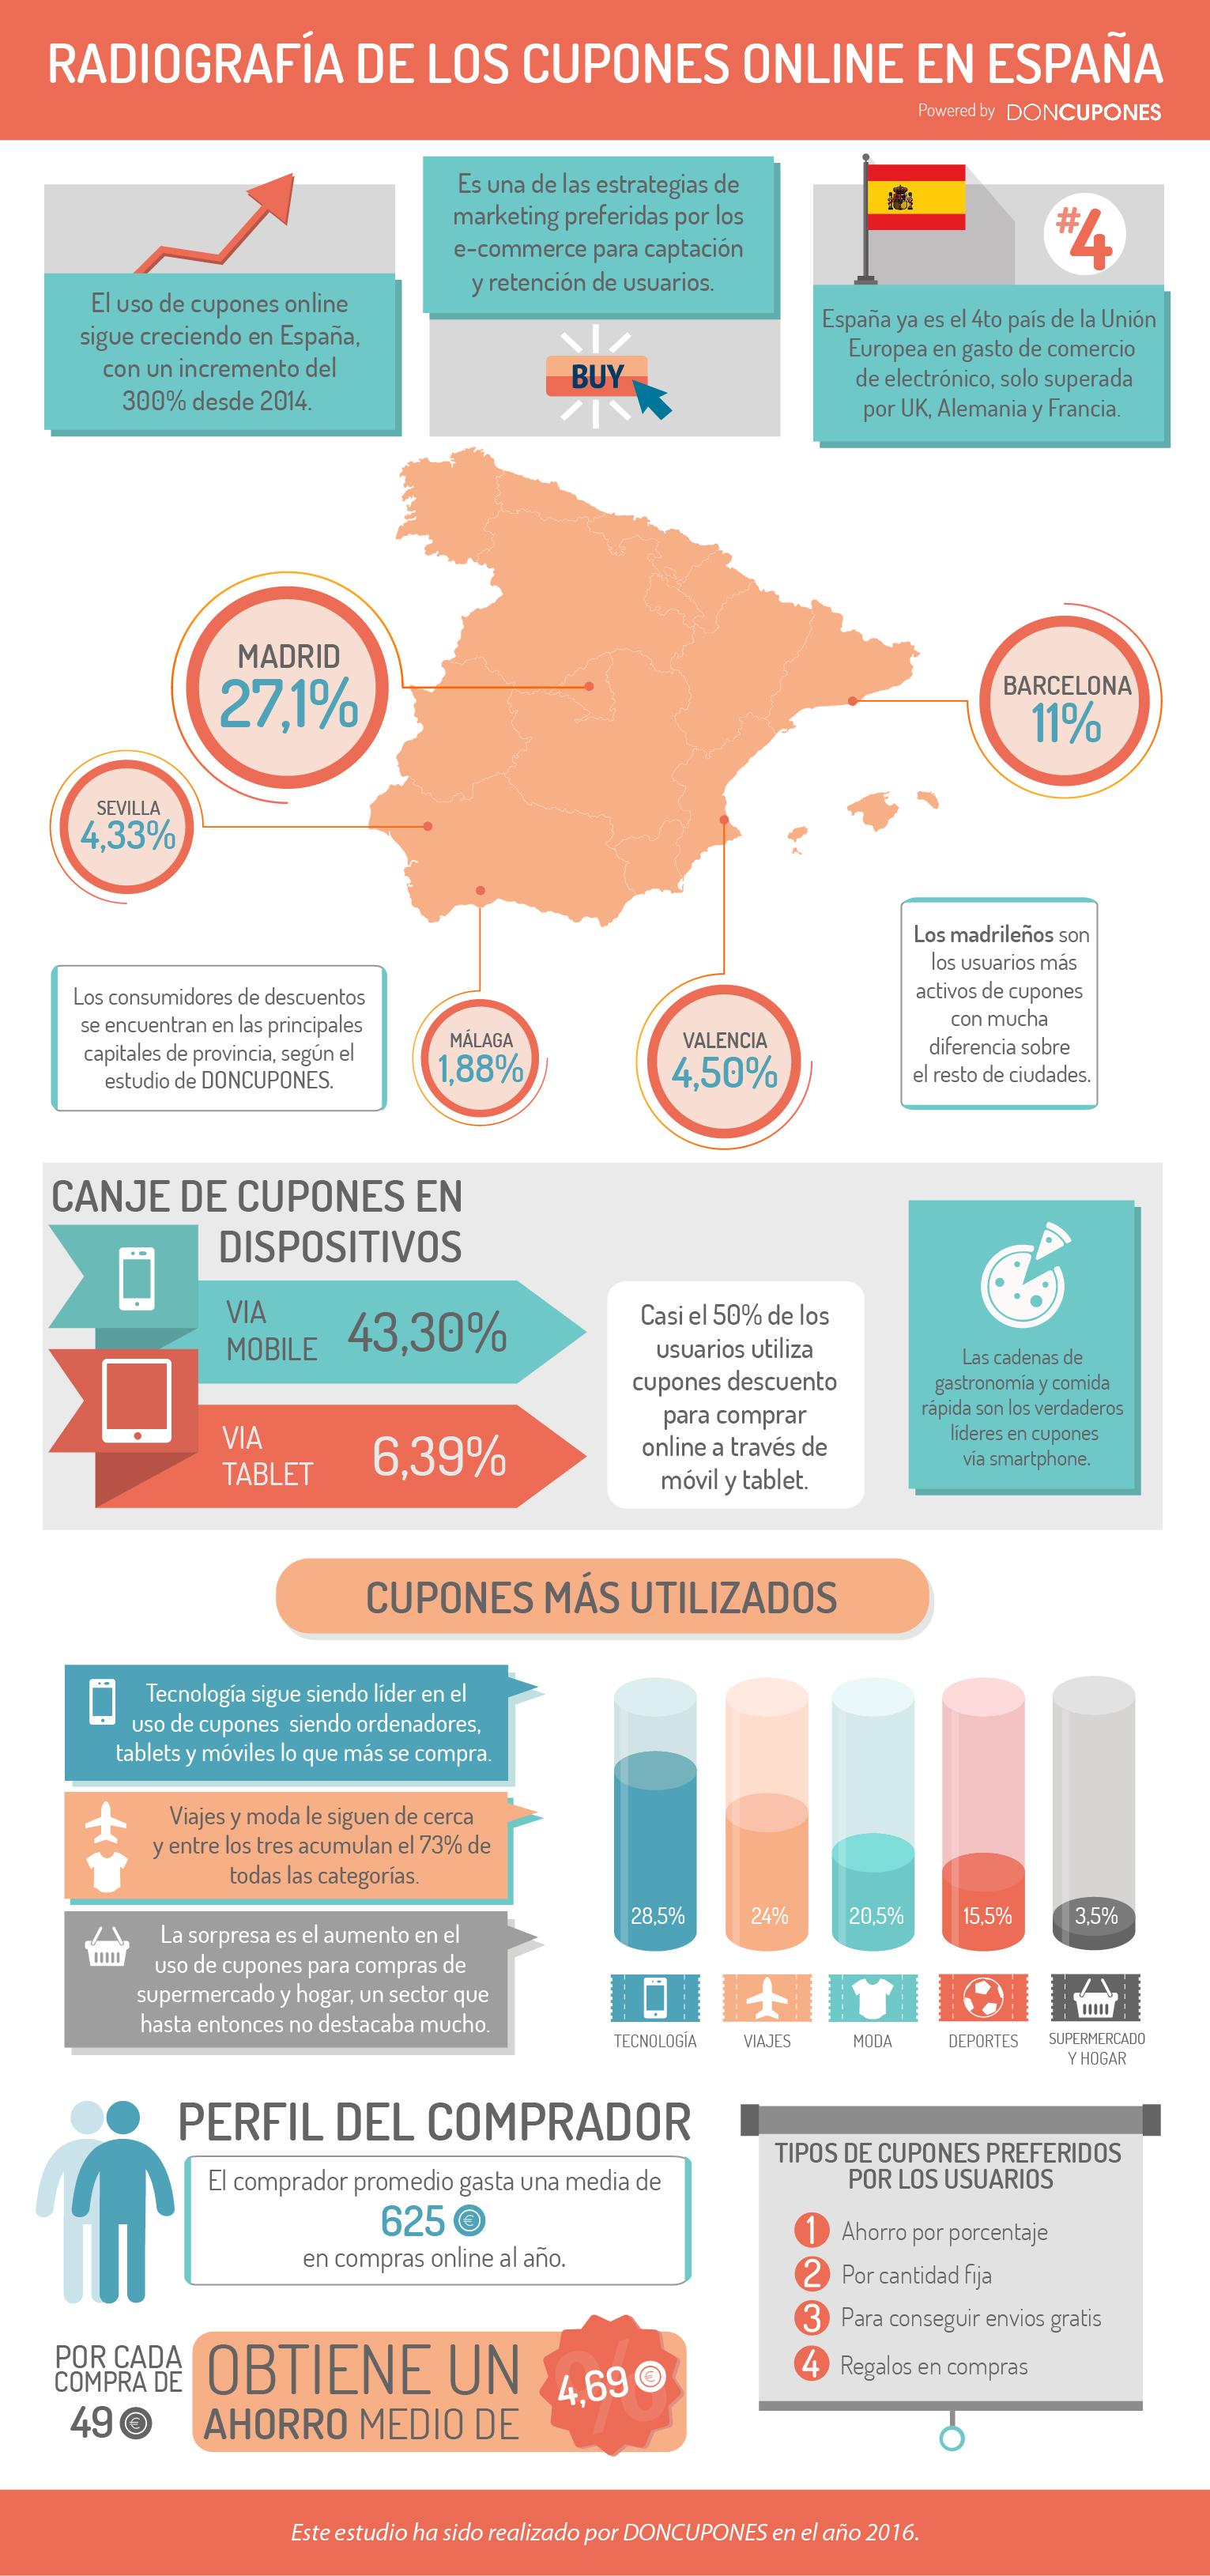 Infografia-doncupones.jpg